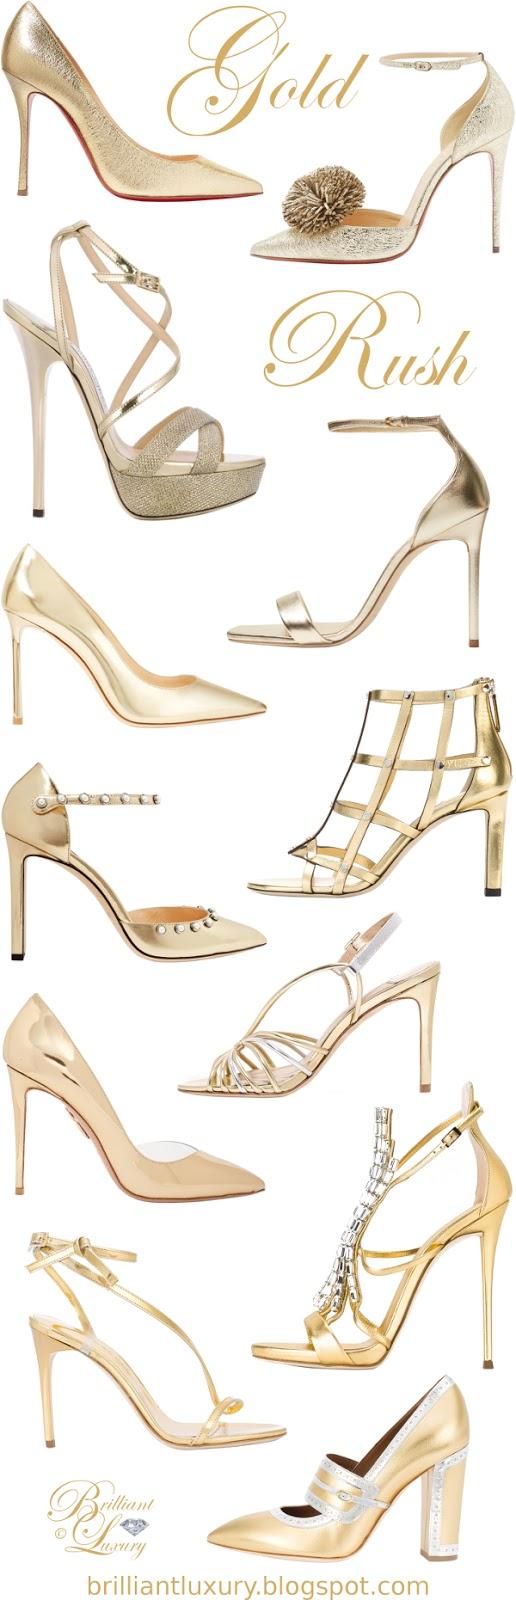 Brilliant Luxury Gold Rush Classy High Heels For